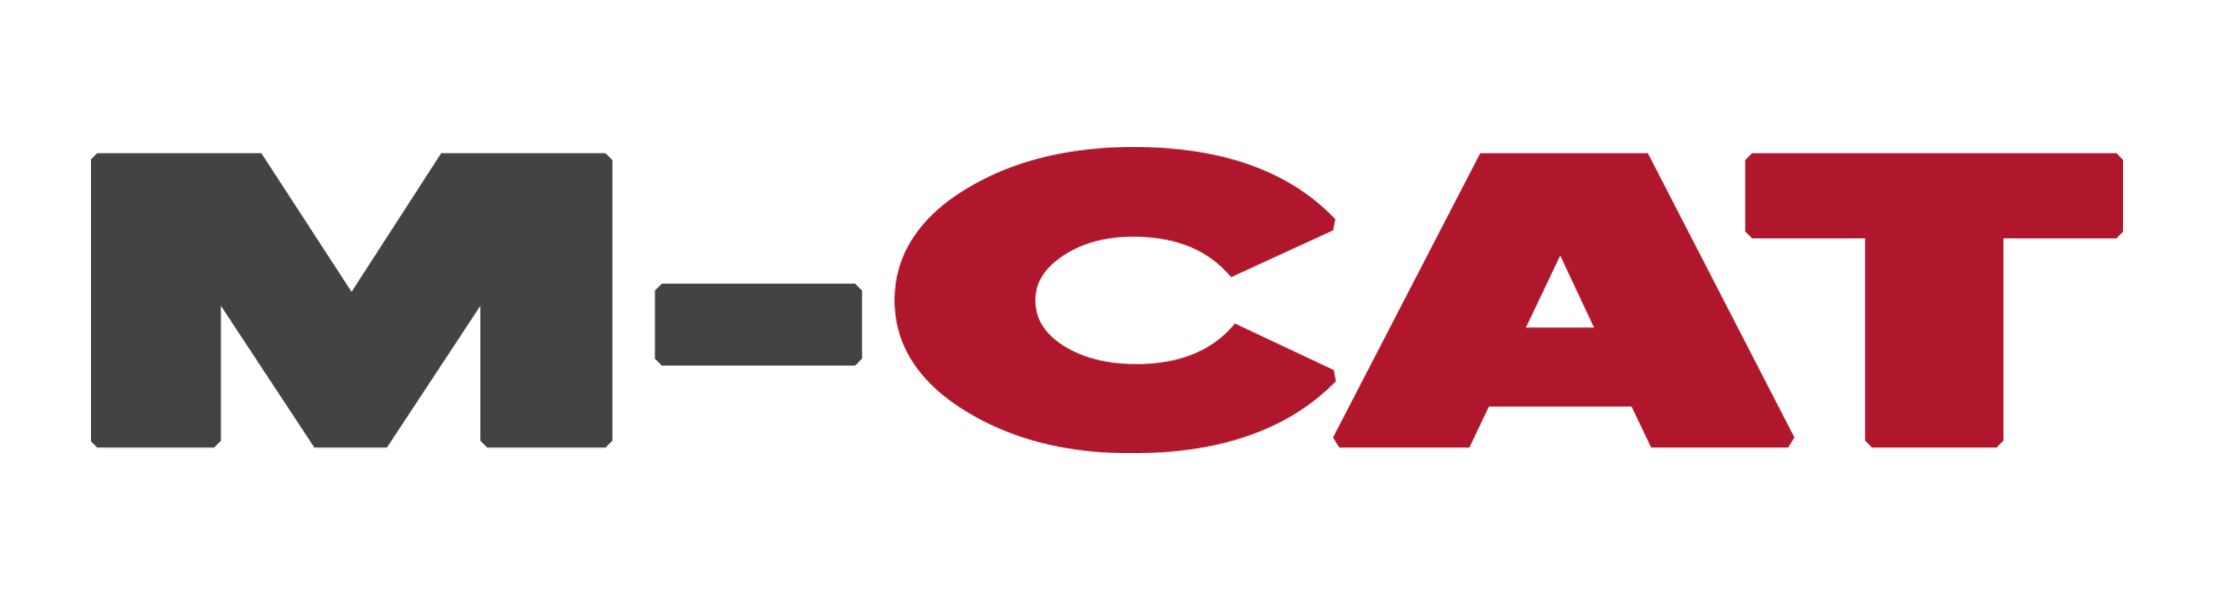 Интернет магазин MD-электроникс